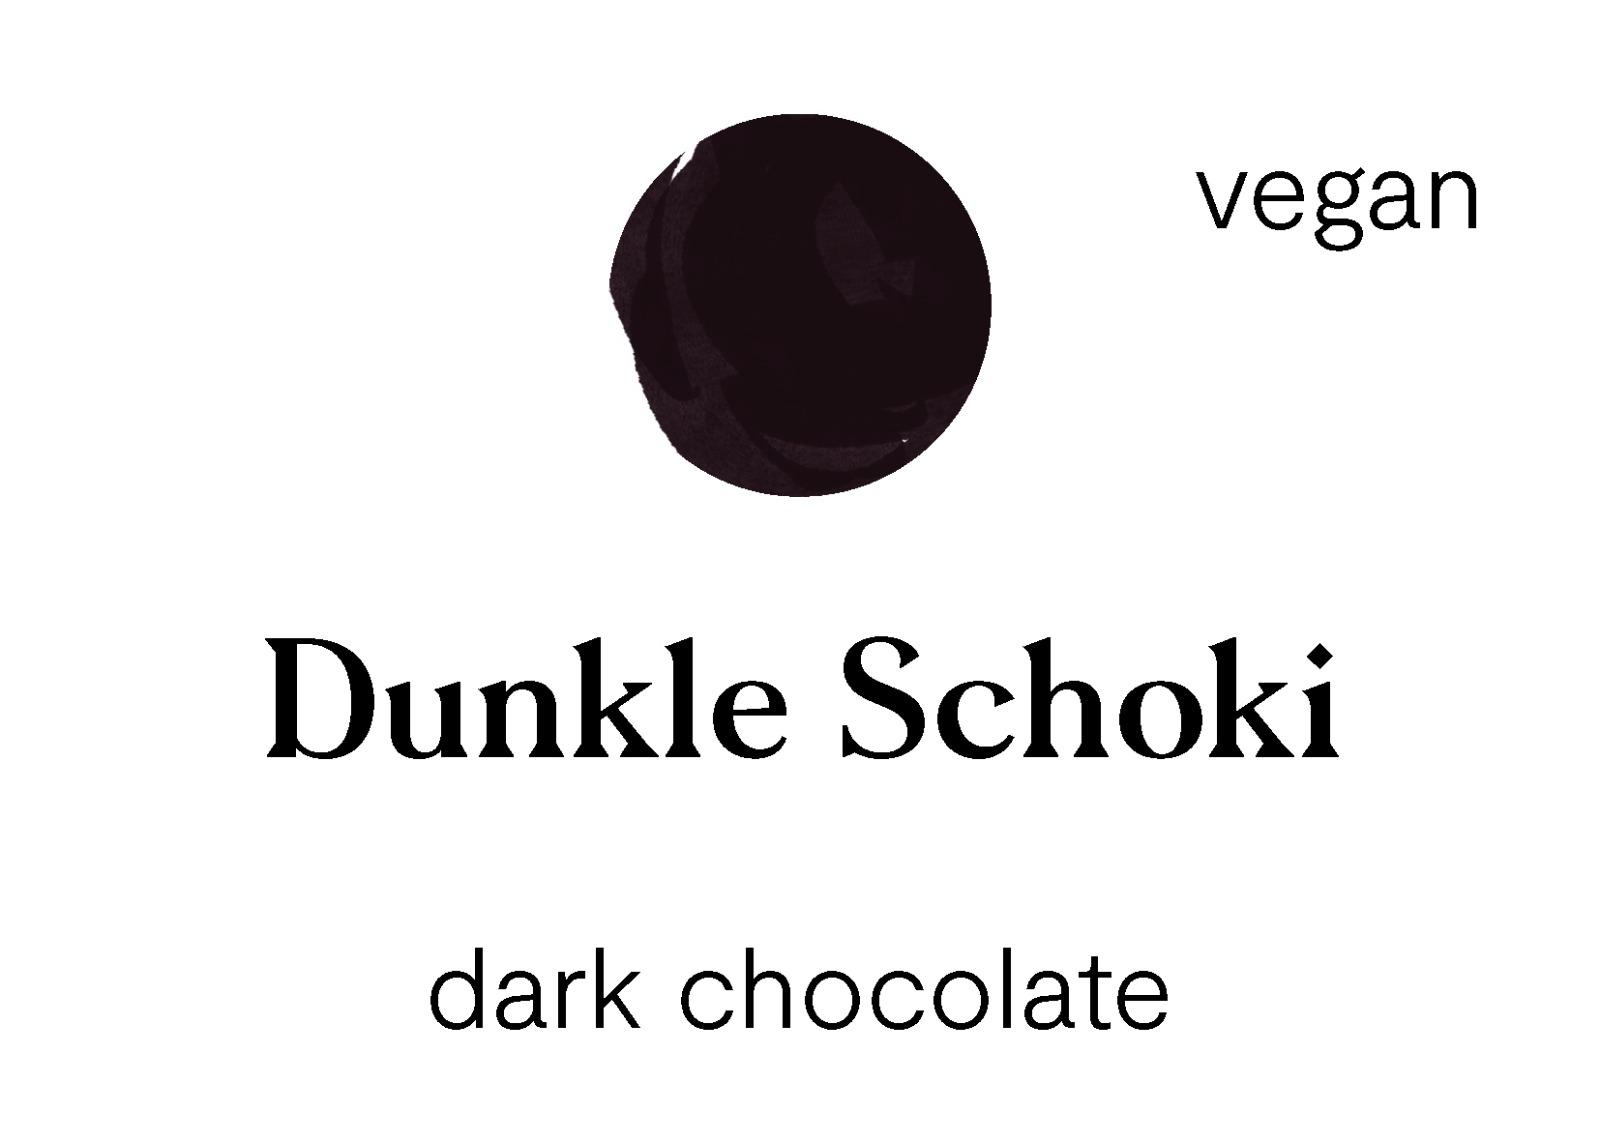 Dunkle Schoki